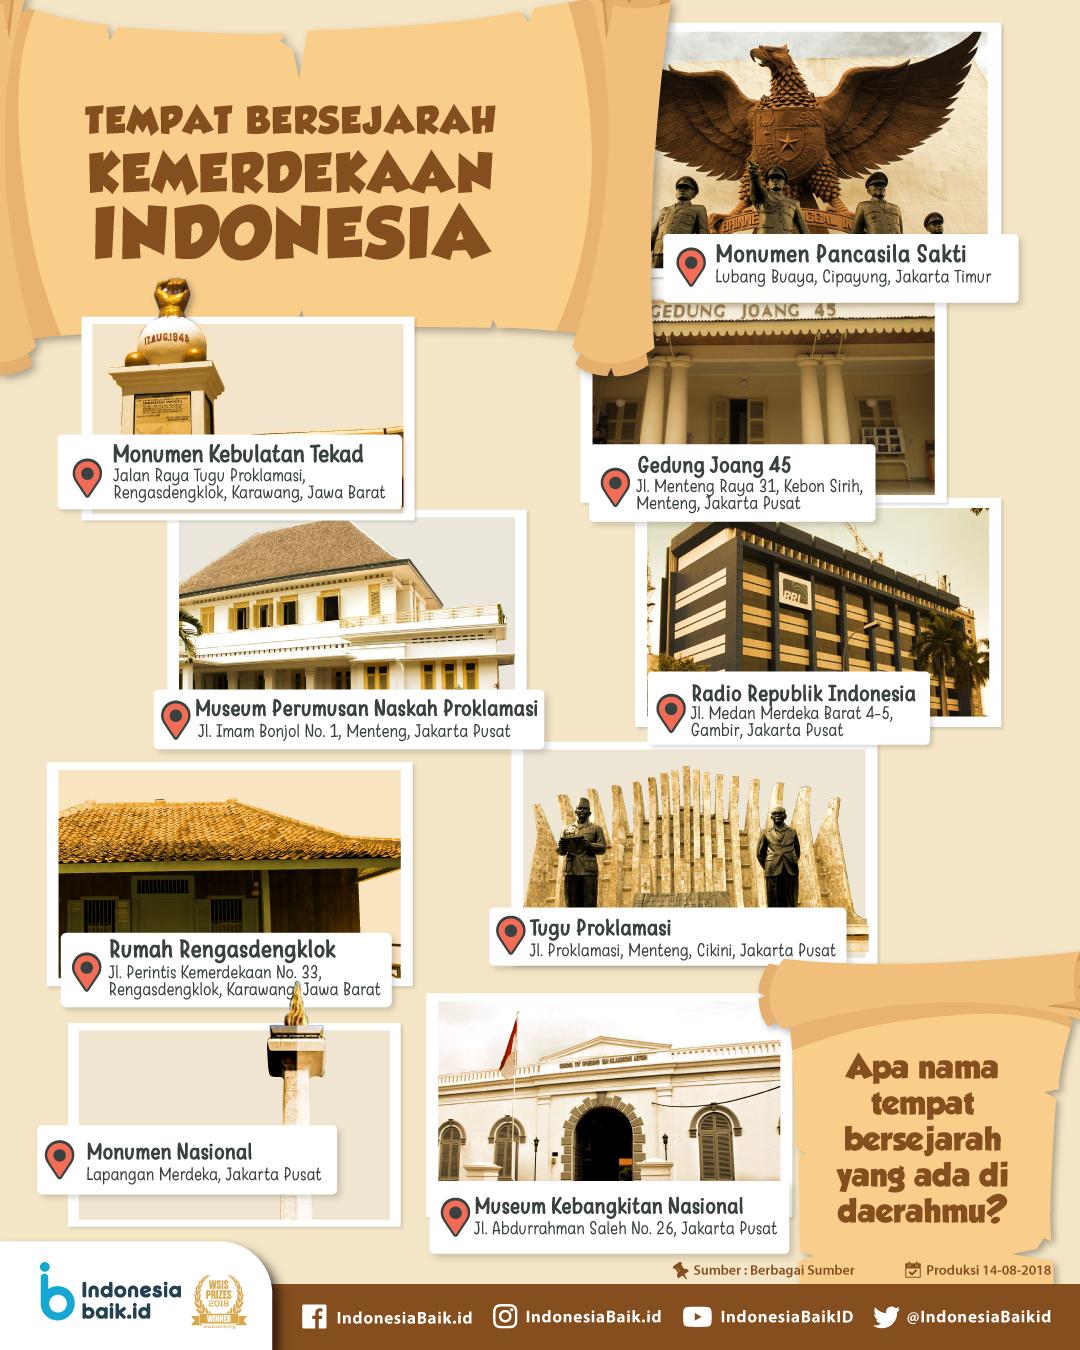 Tempat Bersejarah Kemerdekaan Indonesia  Indonesia Baik